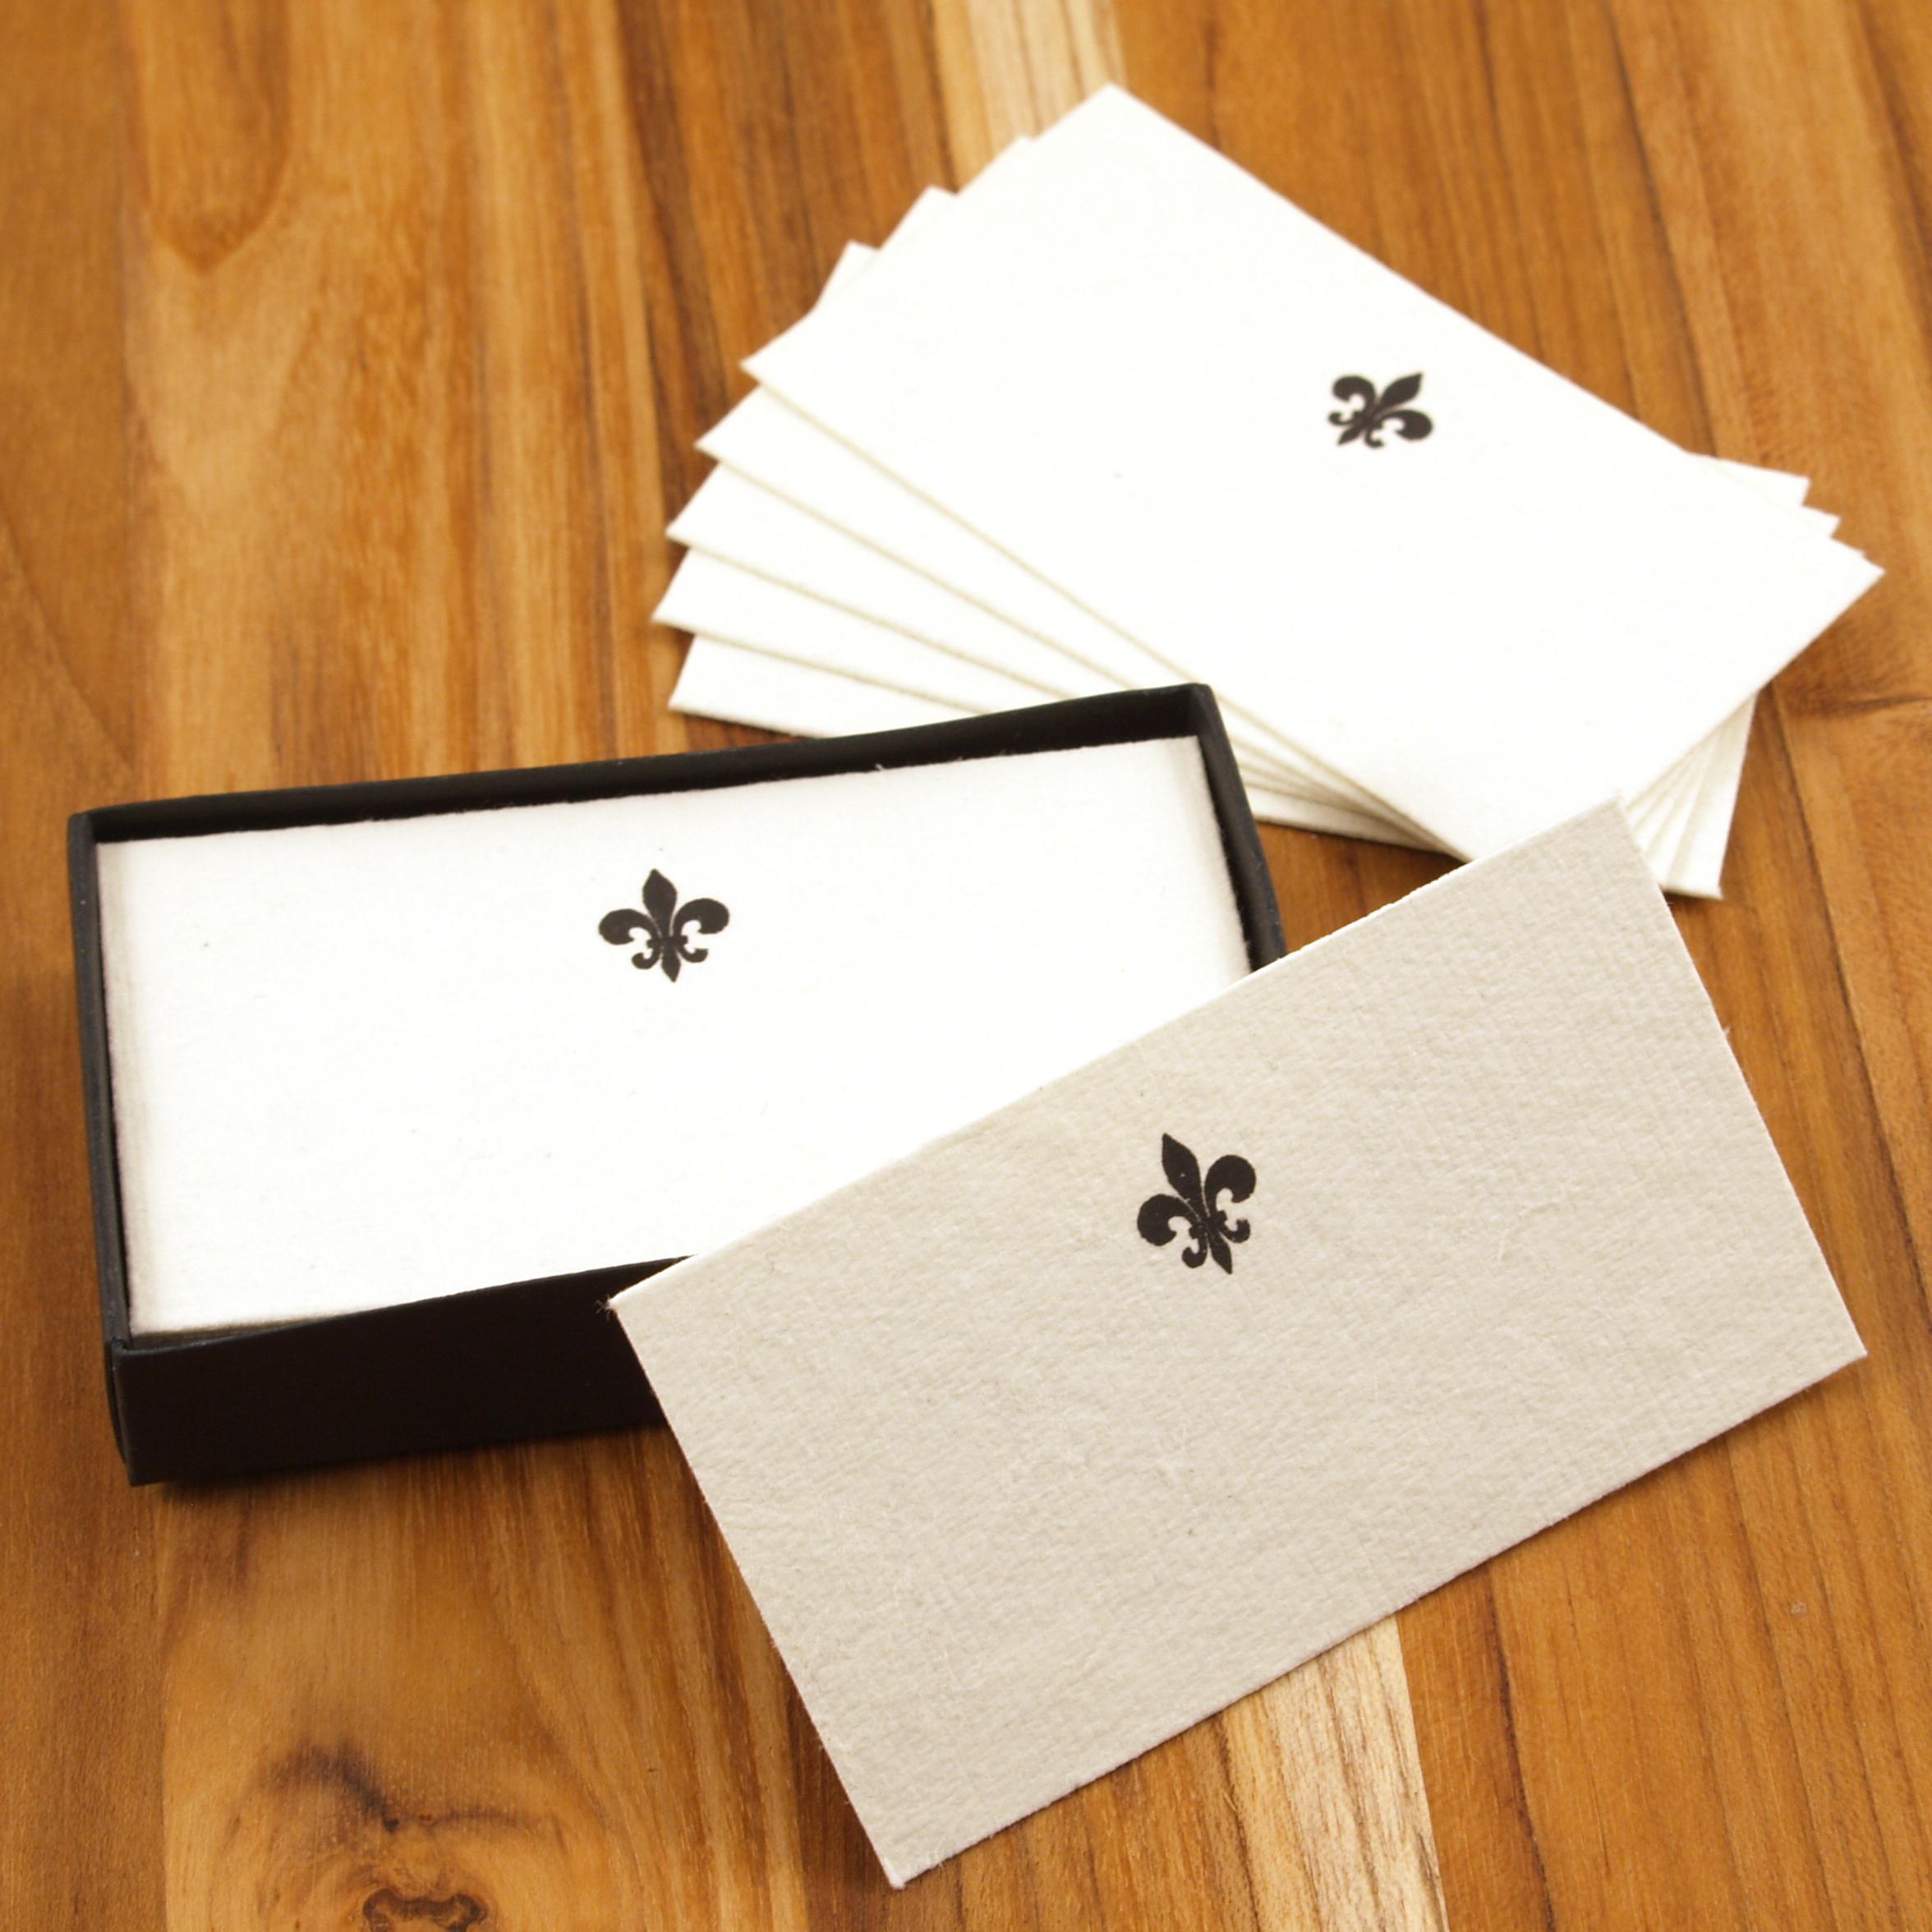 Homart Fleur de Lys Printed Handmade Paper Card, Set of 32